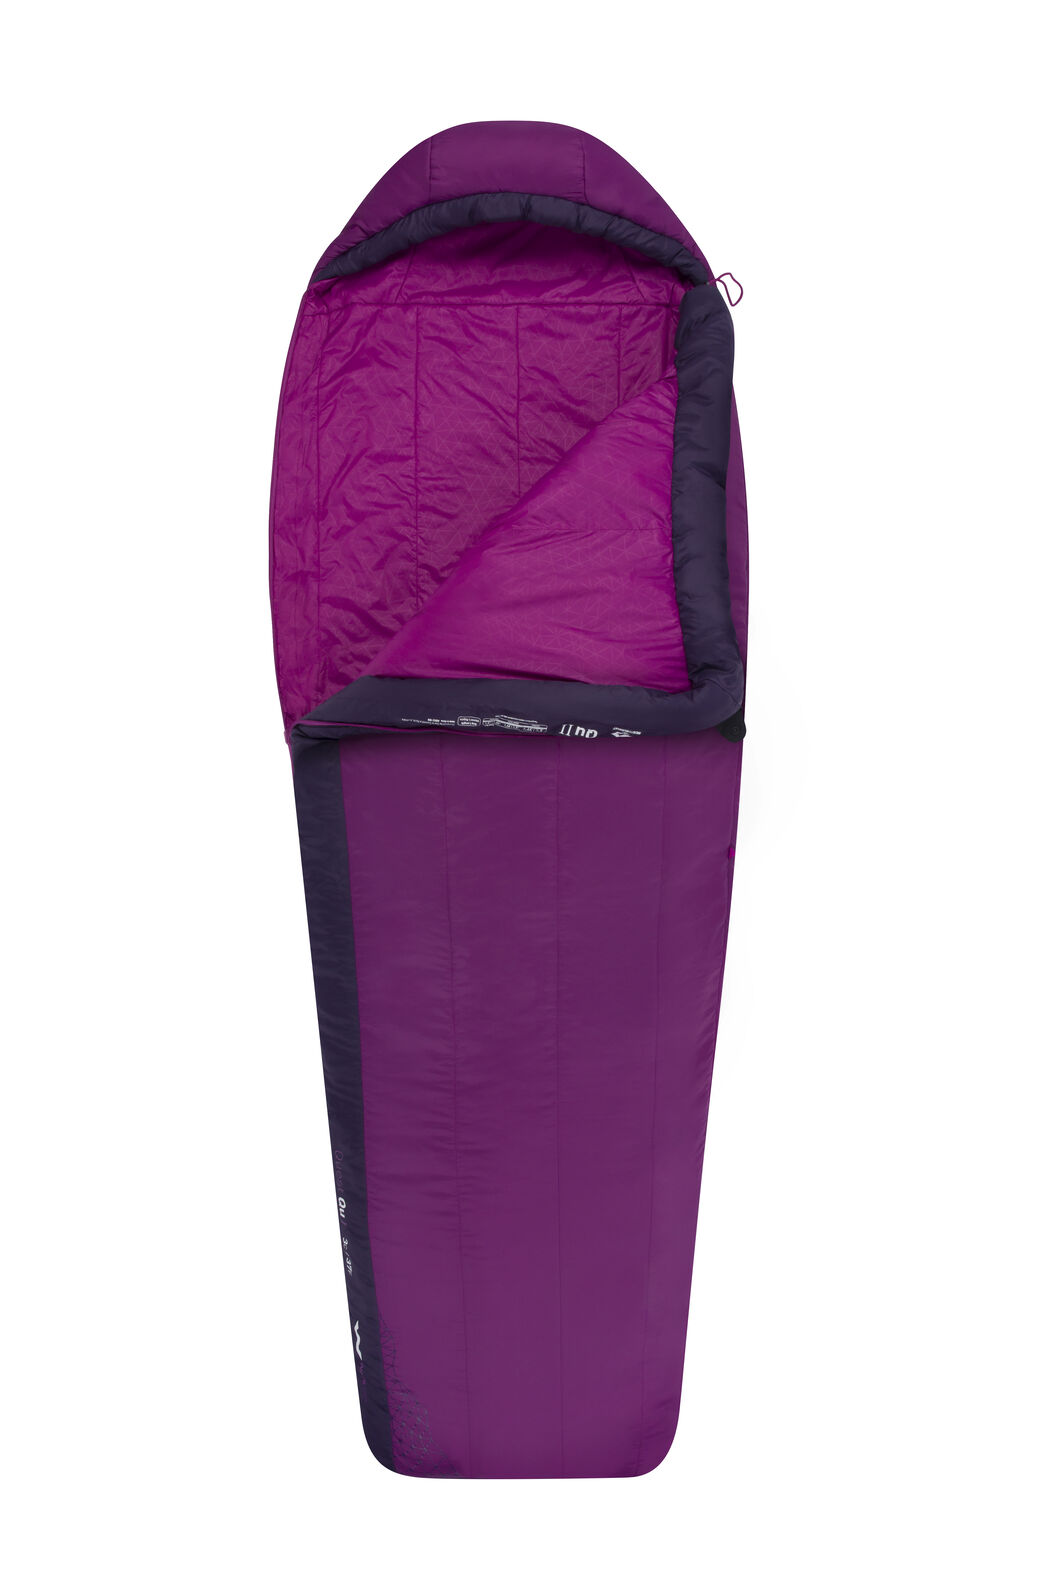 Sea to Summit Quest I Sleeping Bag - Women's Regular, Purple, hi-res